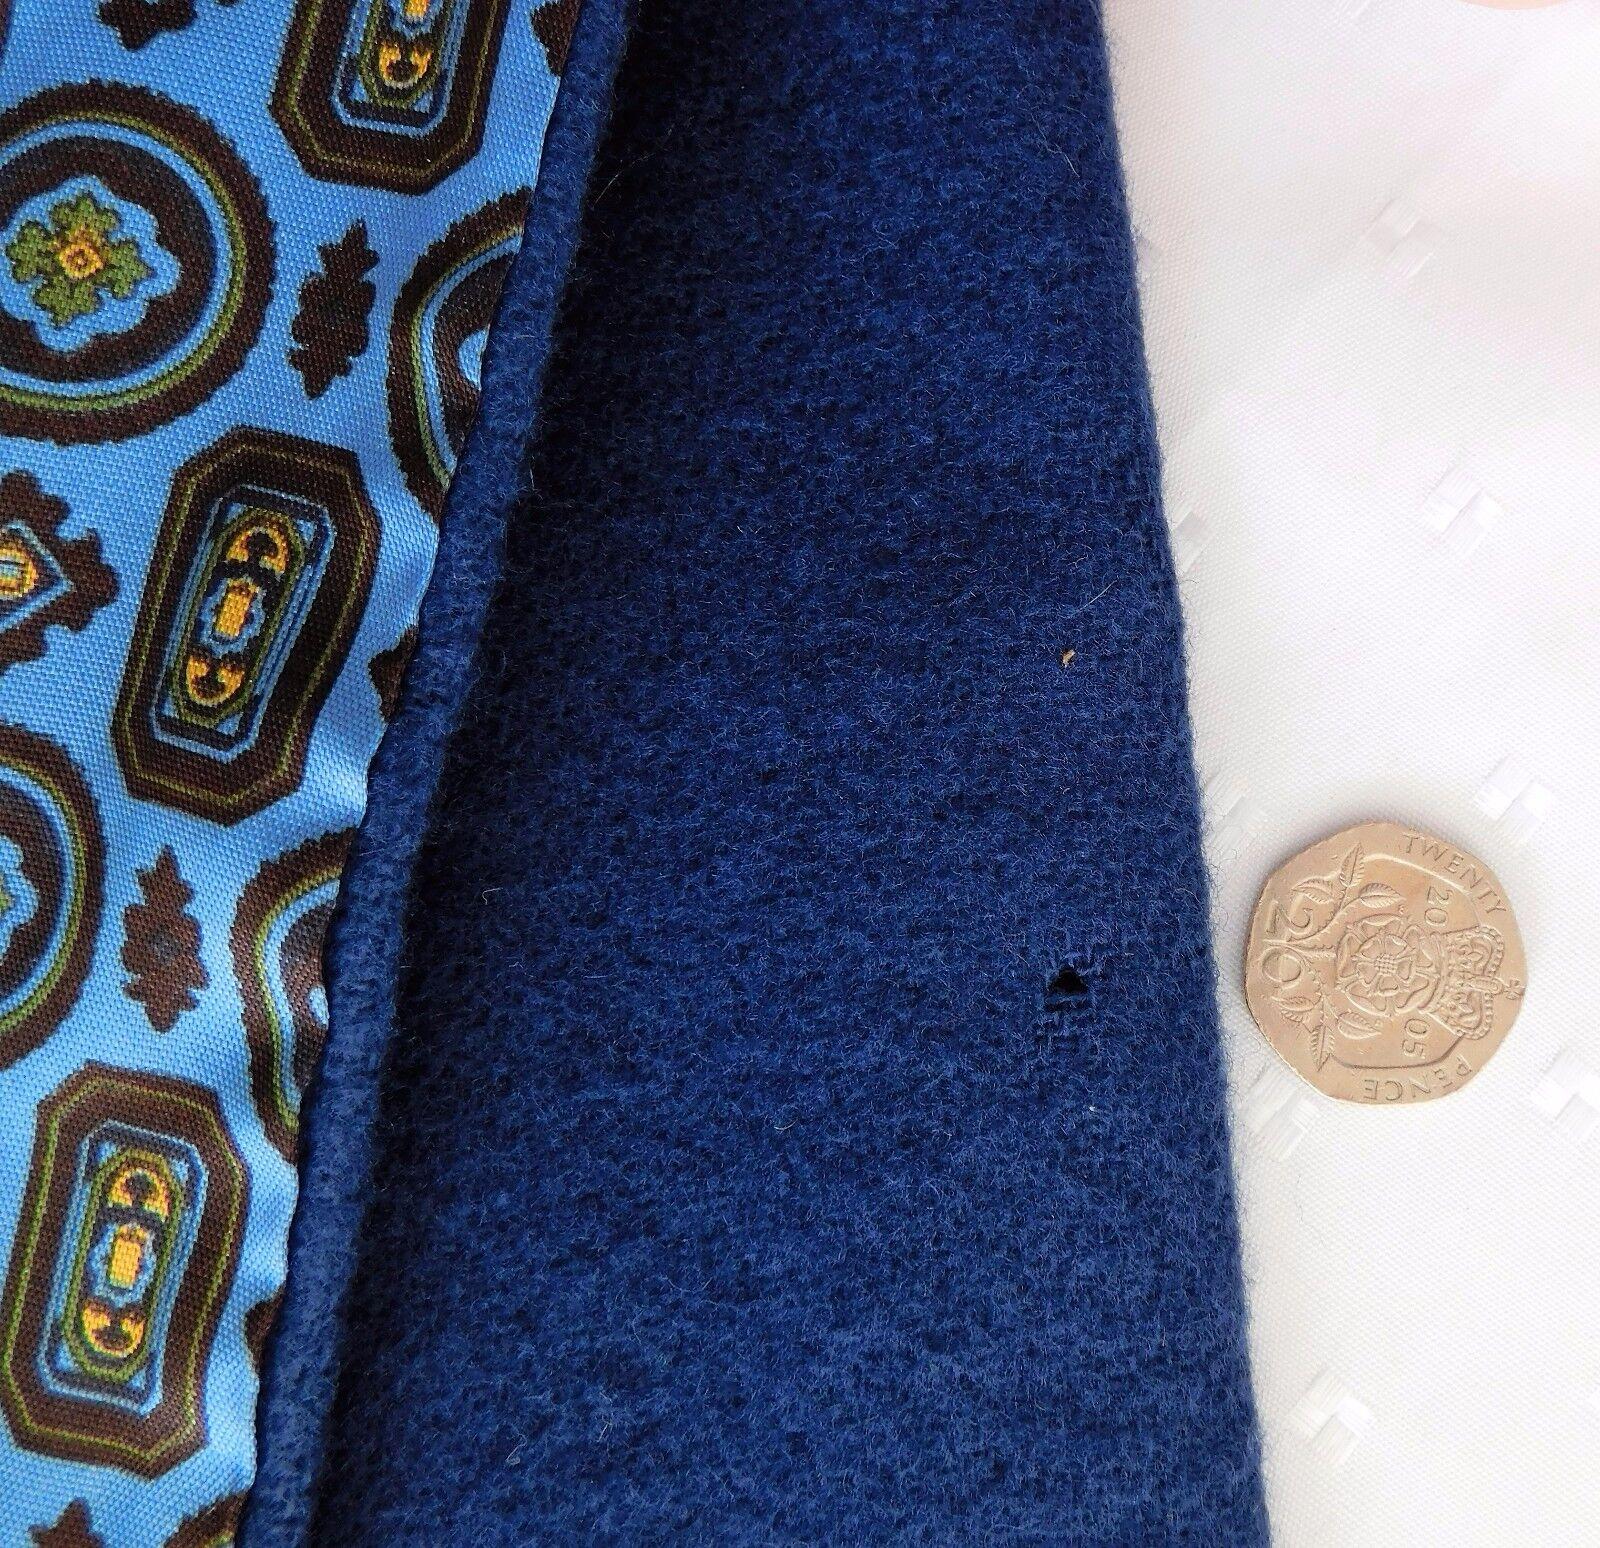 Debenhams vintage British scarf blue patterned acetate and lambswool